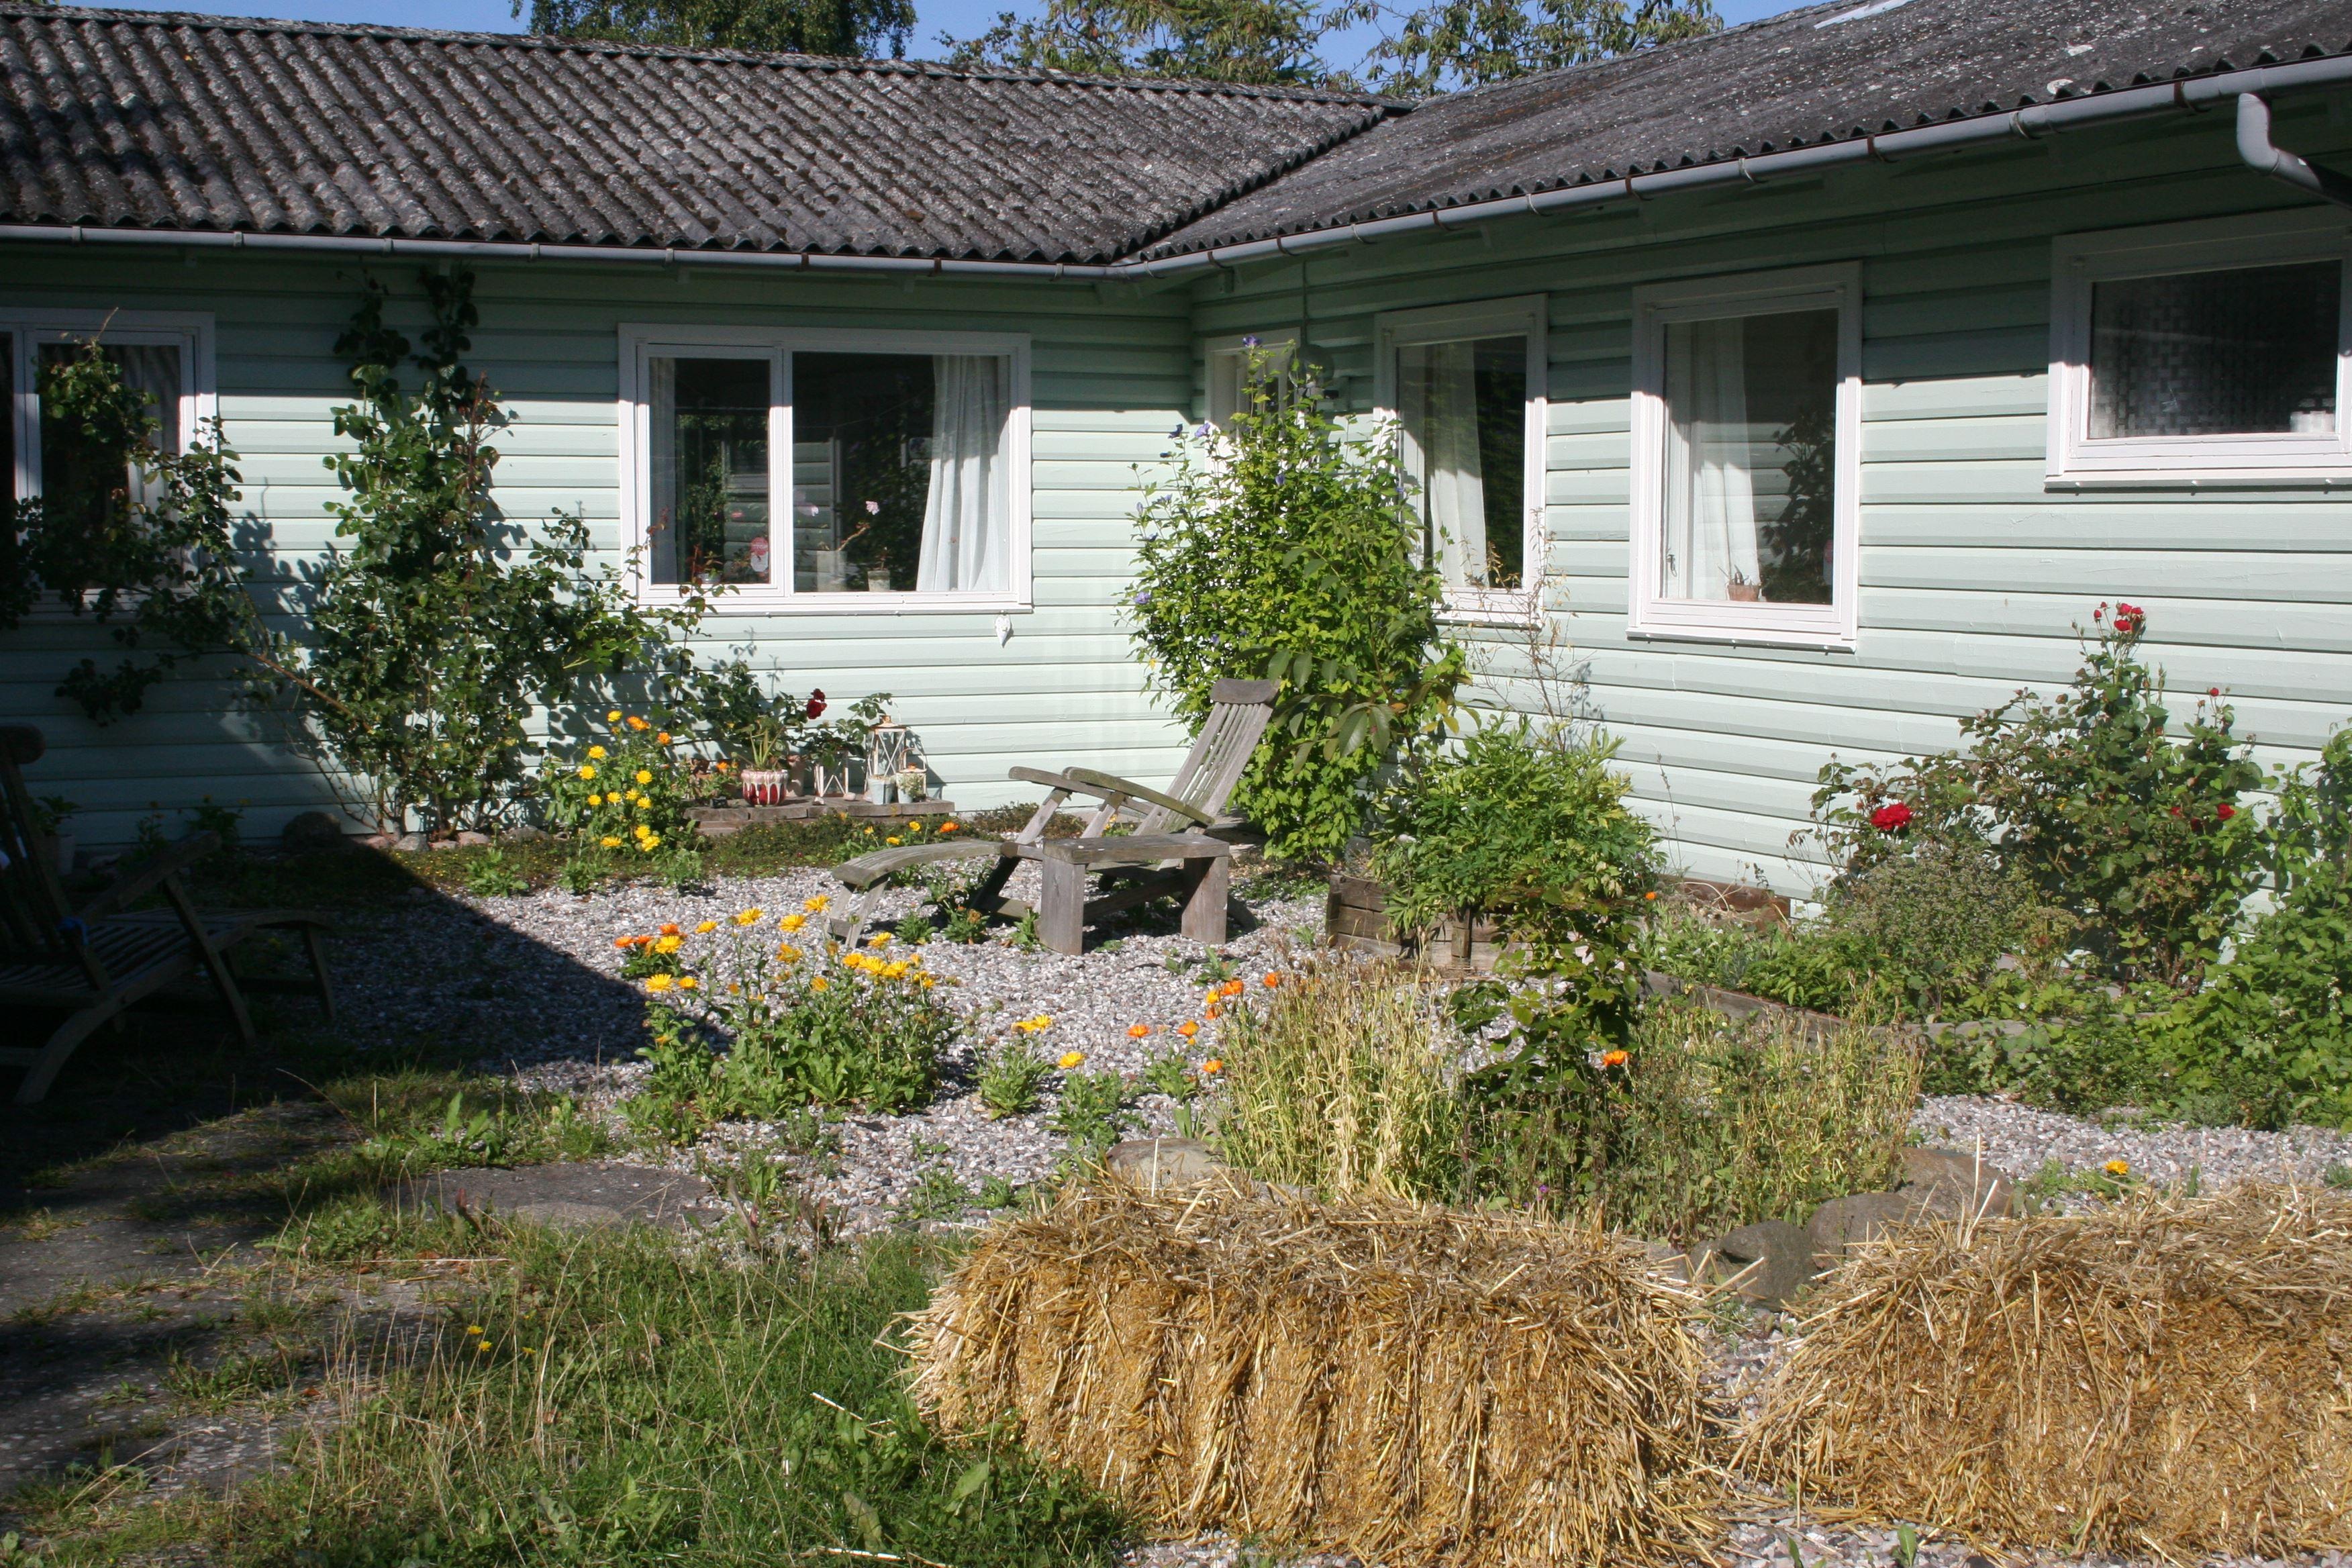 Rynkebjerg 8, Ørslev, 4760 Vordingborg